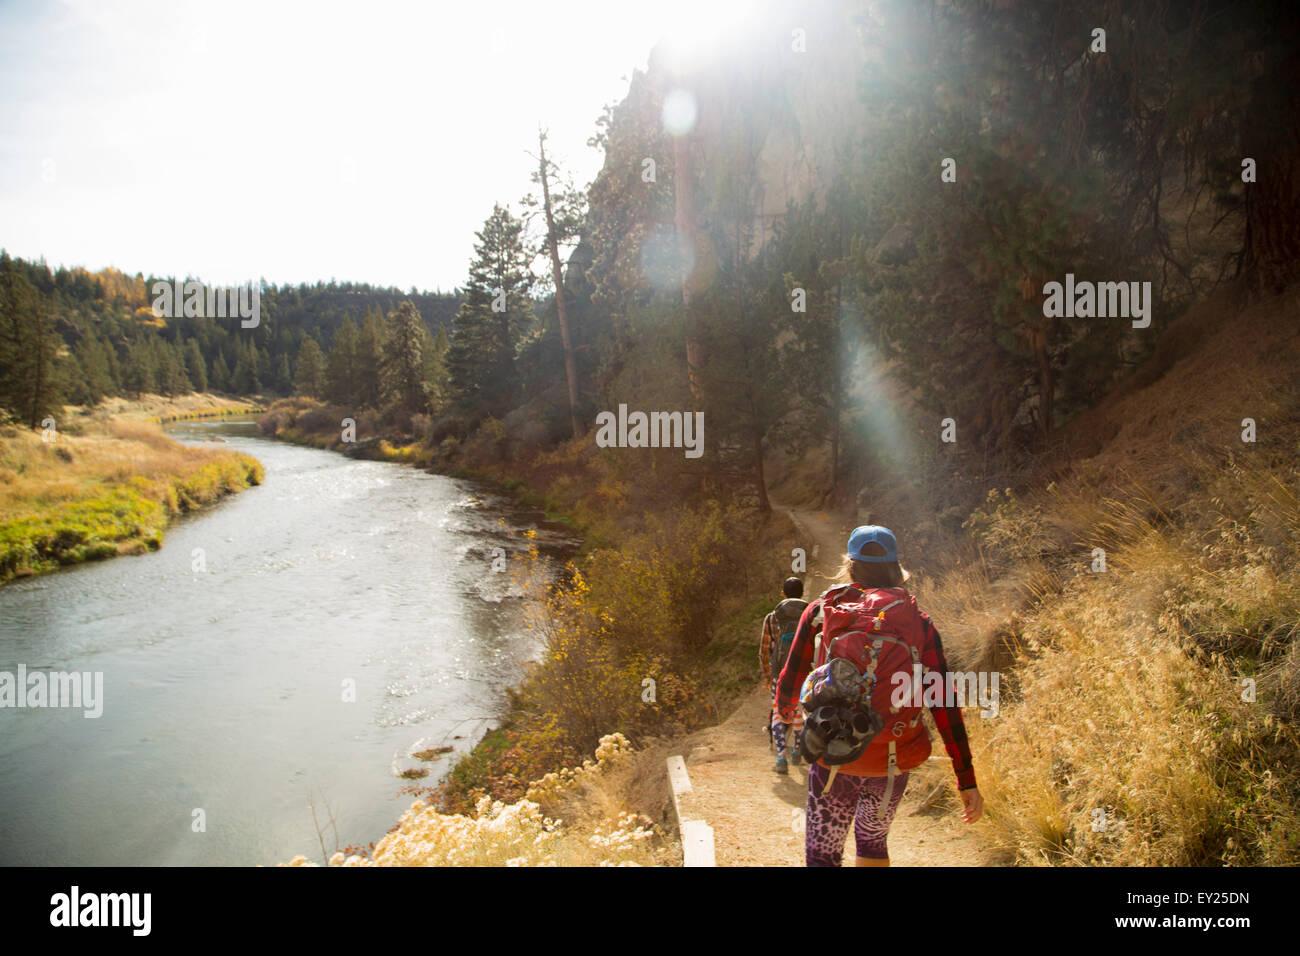 Hiker walking on track, Smith Rock State Park, Oregon, US - Stock Image